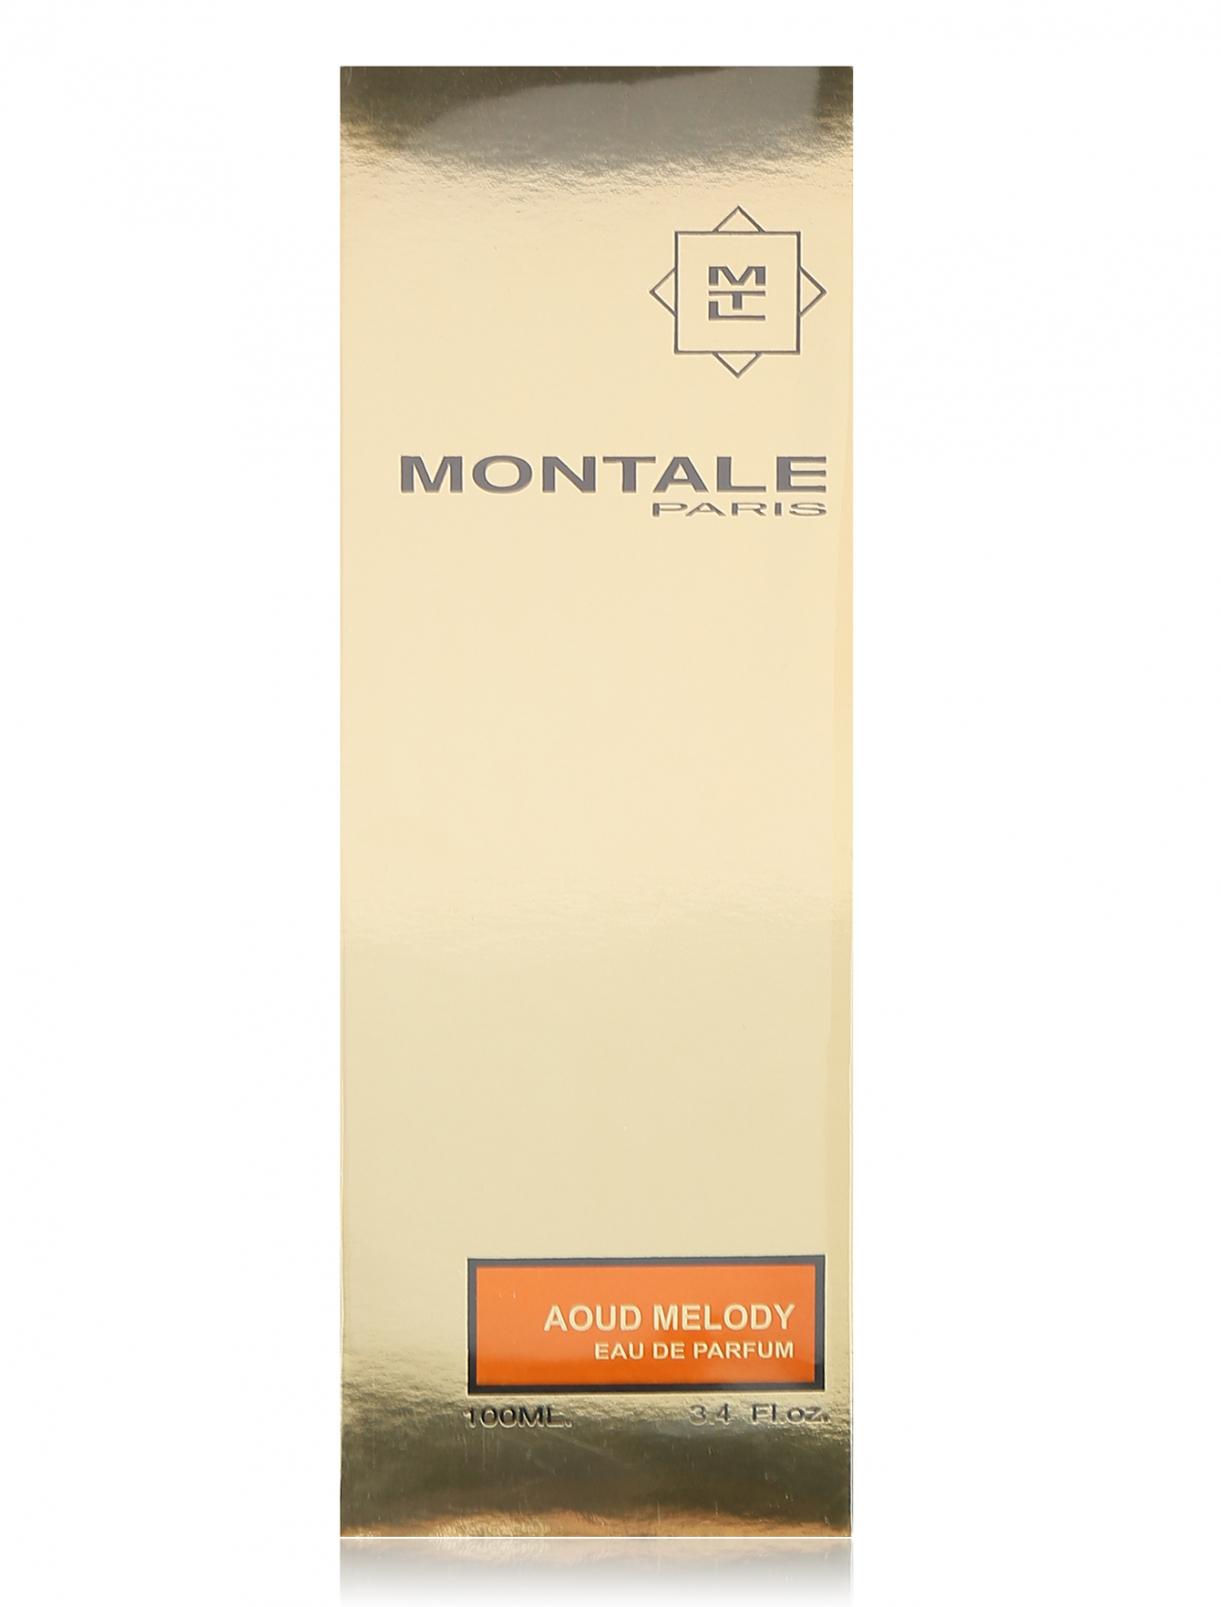 Парфюмерная вода 100 мл Aoud Melody Montale  –  Общий вид